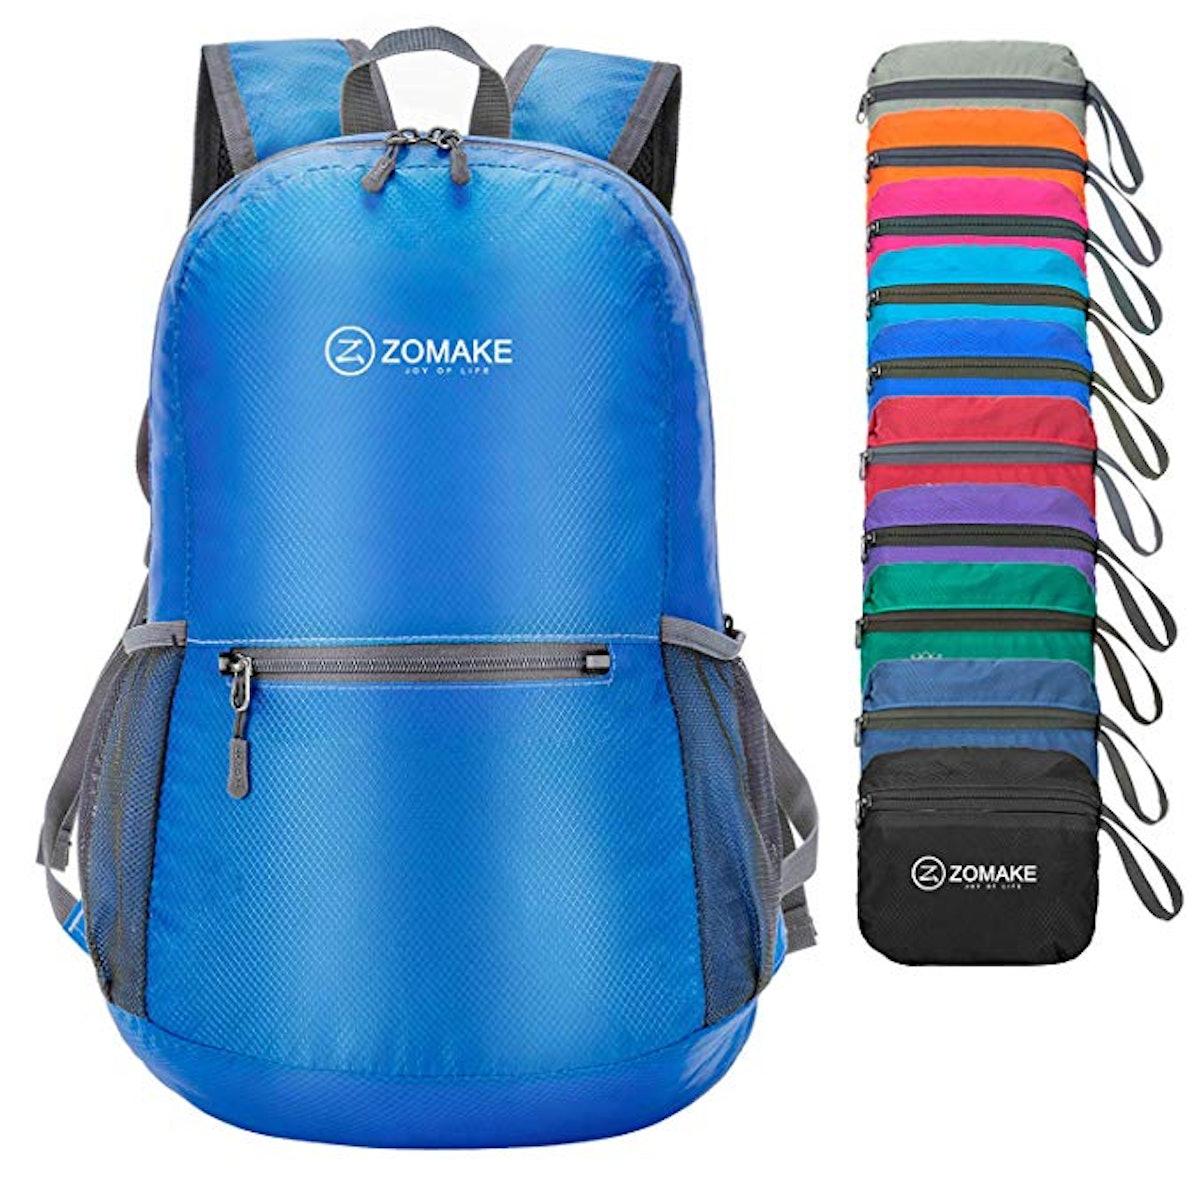 ZOMAKE Ultra Lightweight Packable Backpack